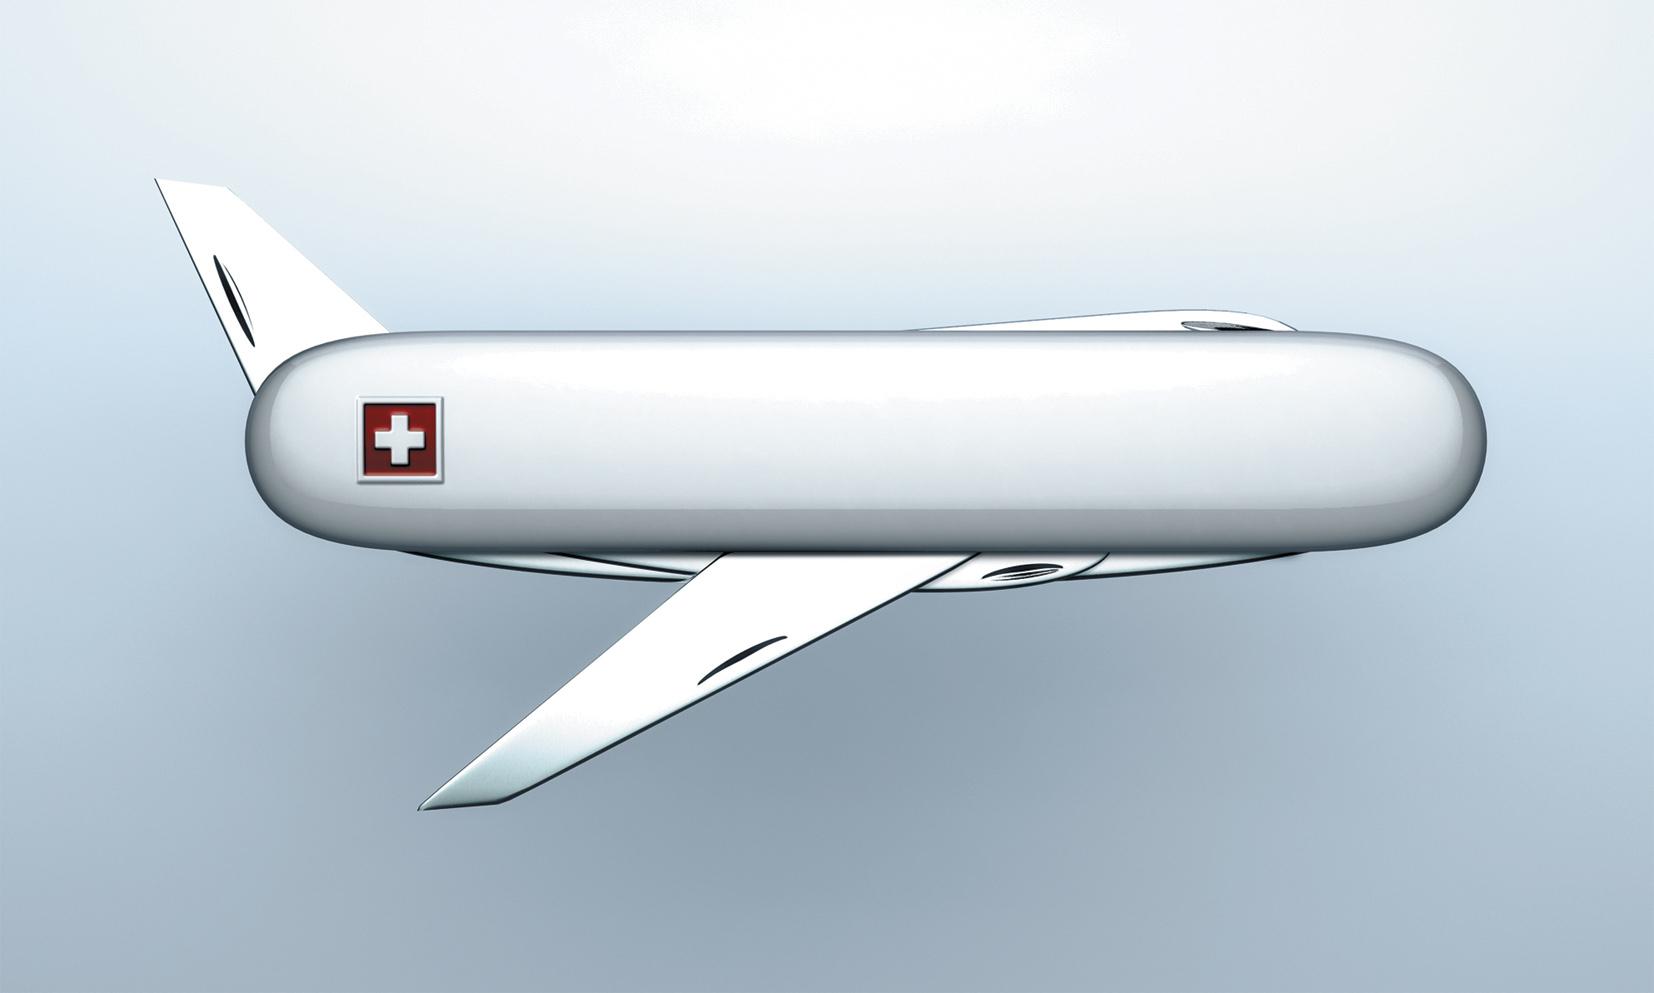 Utility Knife Airplane